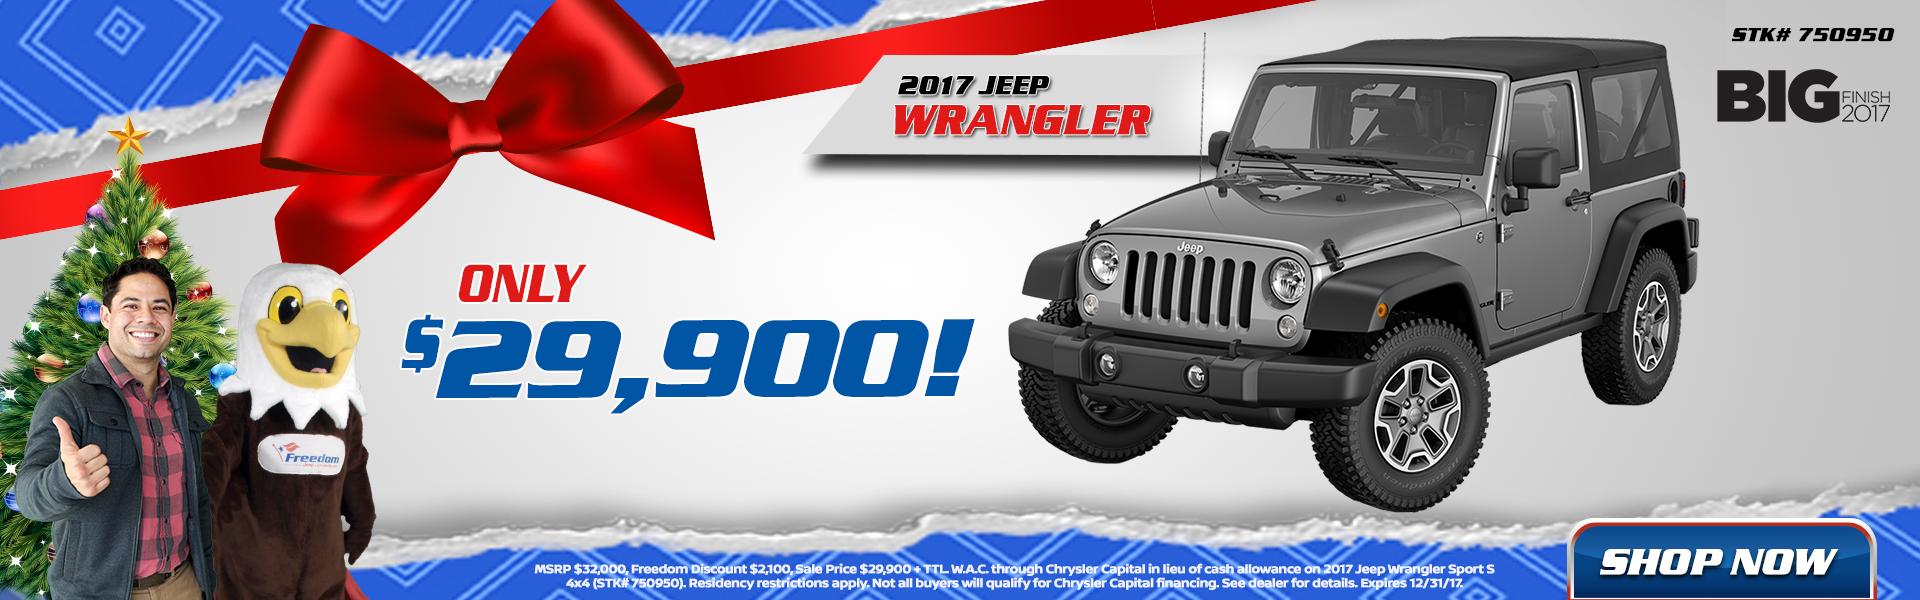 Car Dealerships In Killeen Tx >> Freedom Jeep Chrysler | Chrysler, Jeep Dealer in Killeen, TX